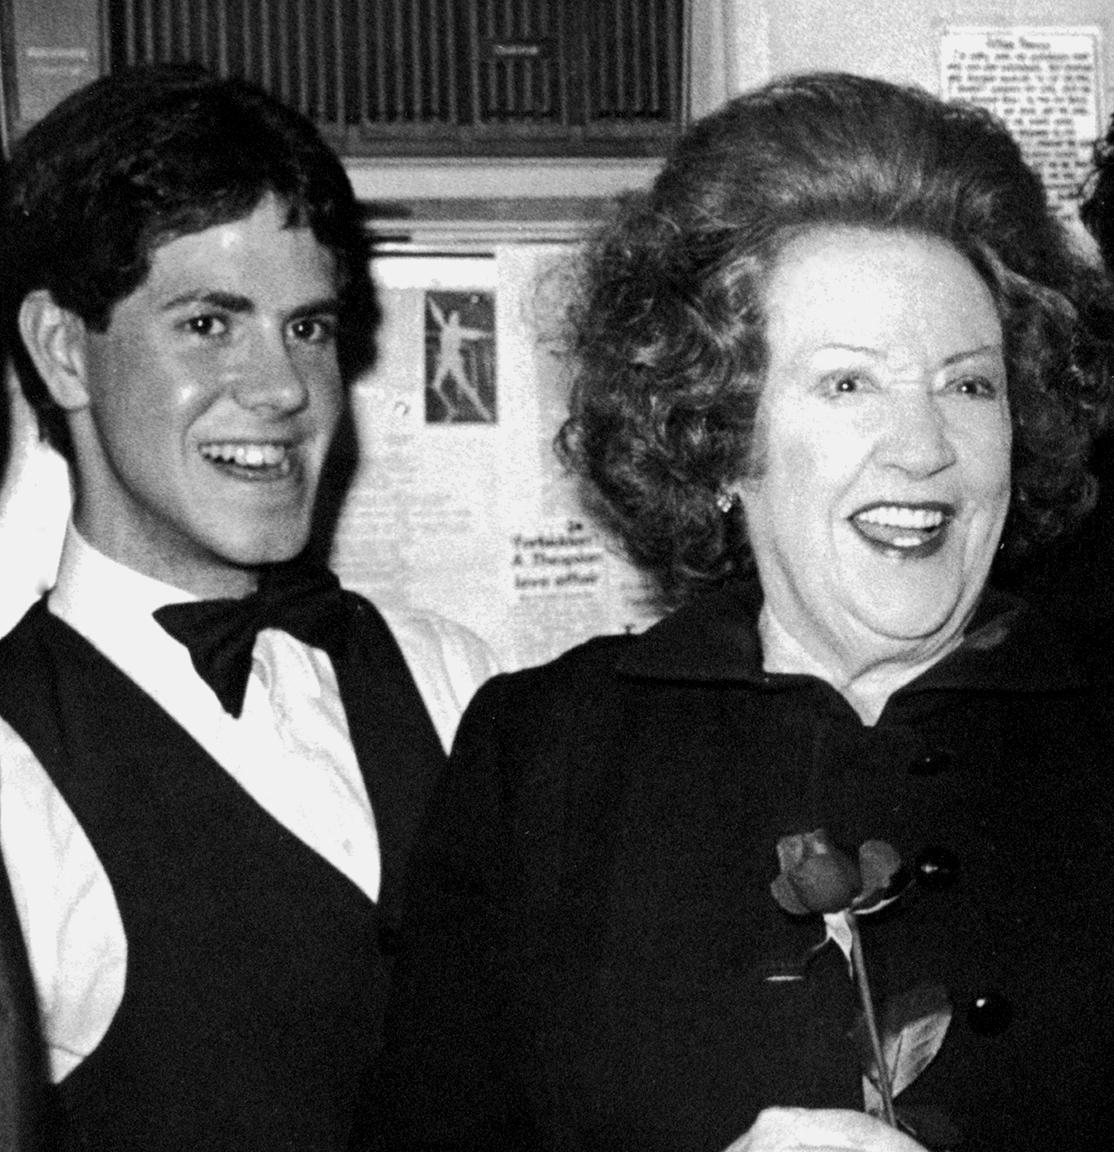 Fred Barton and Ethel Merman, February, 1982